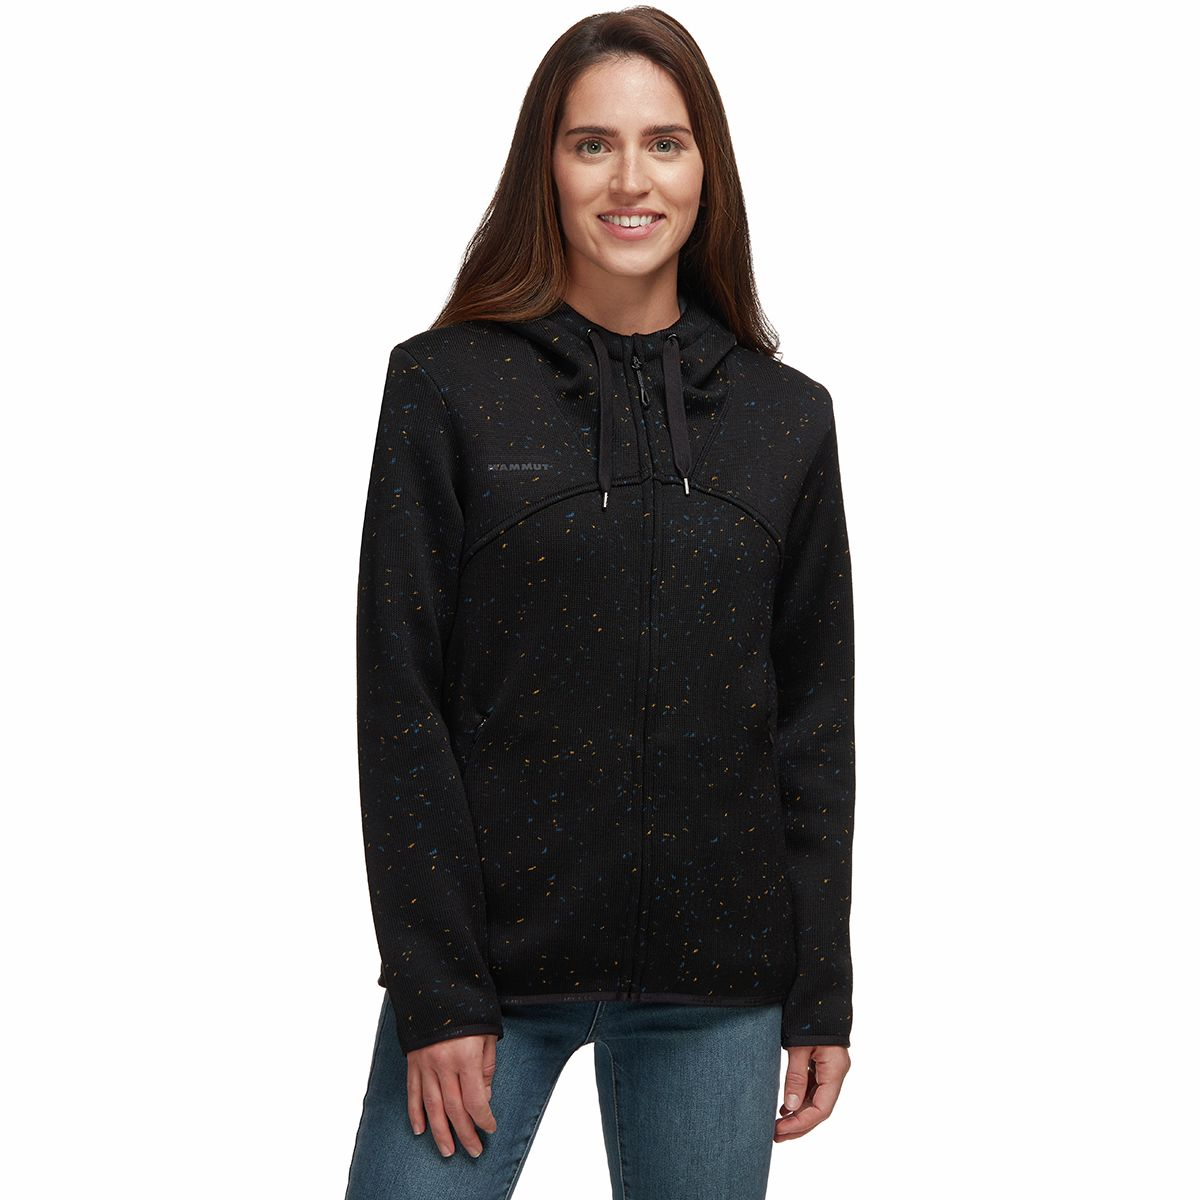 Chamuera Hooded Jacket - Women